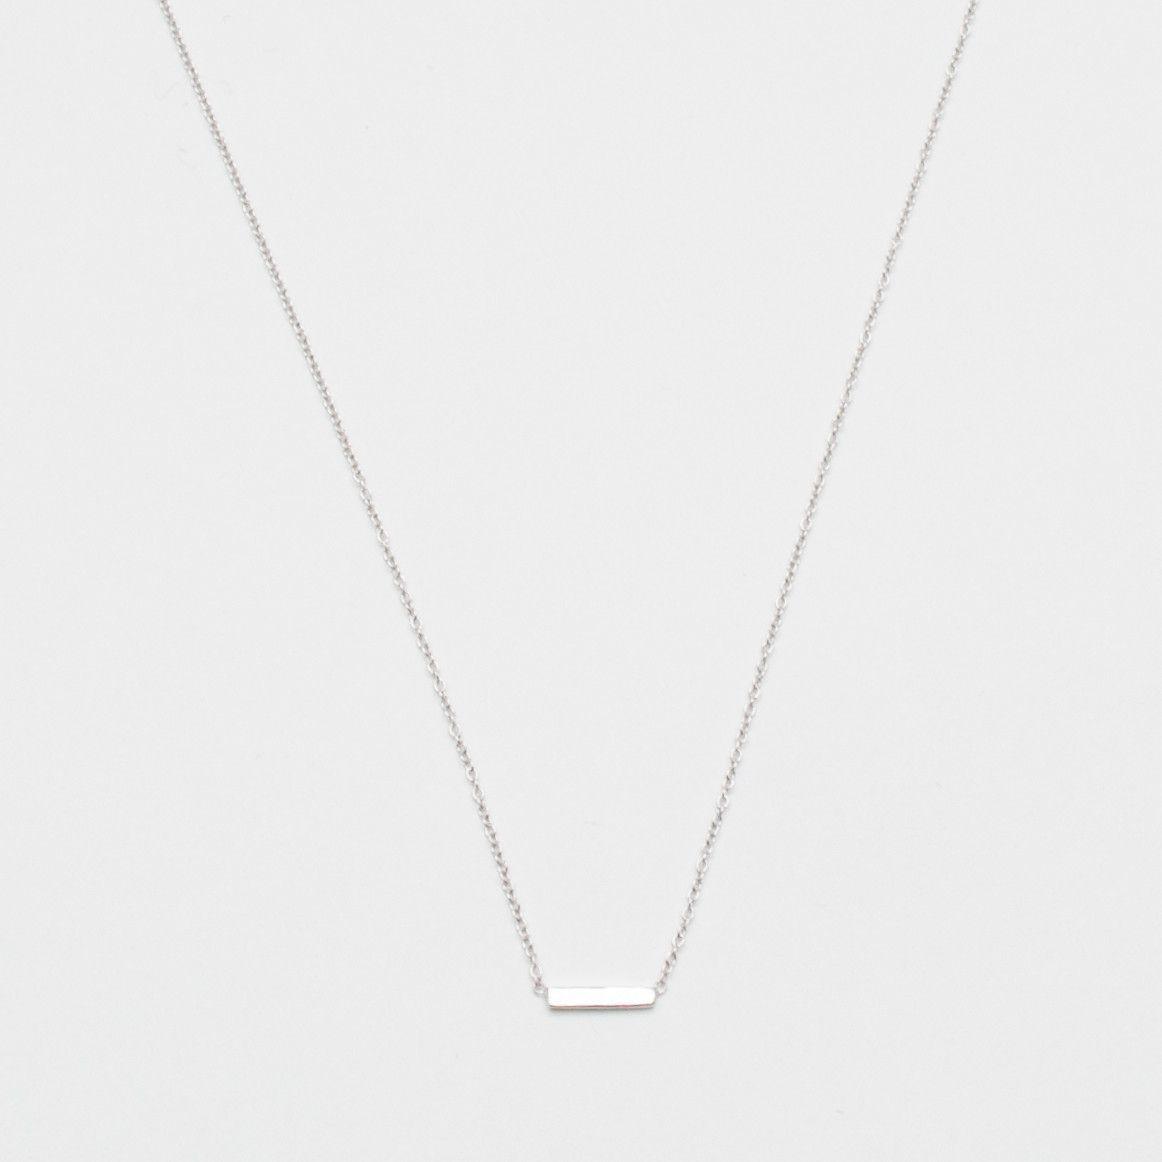 Adina Reyter Bar Necklace - Silver